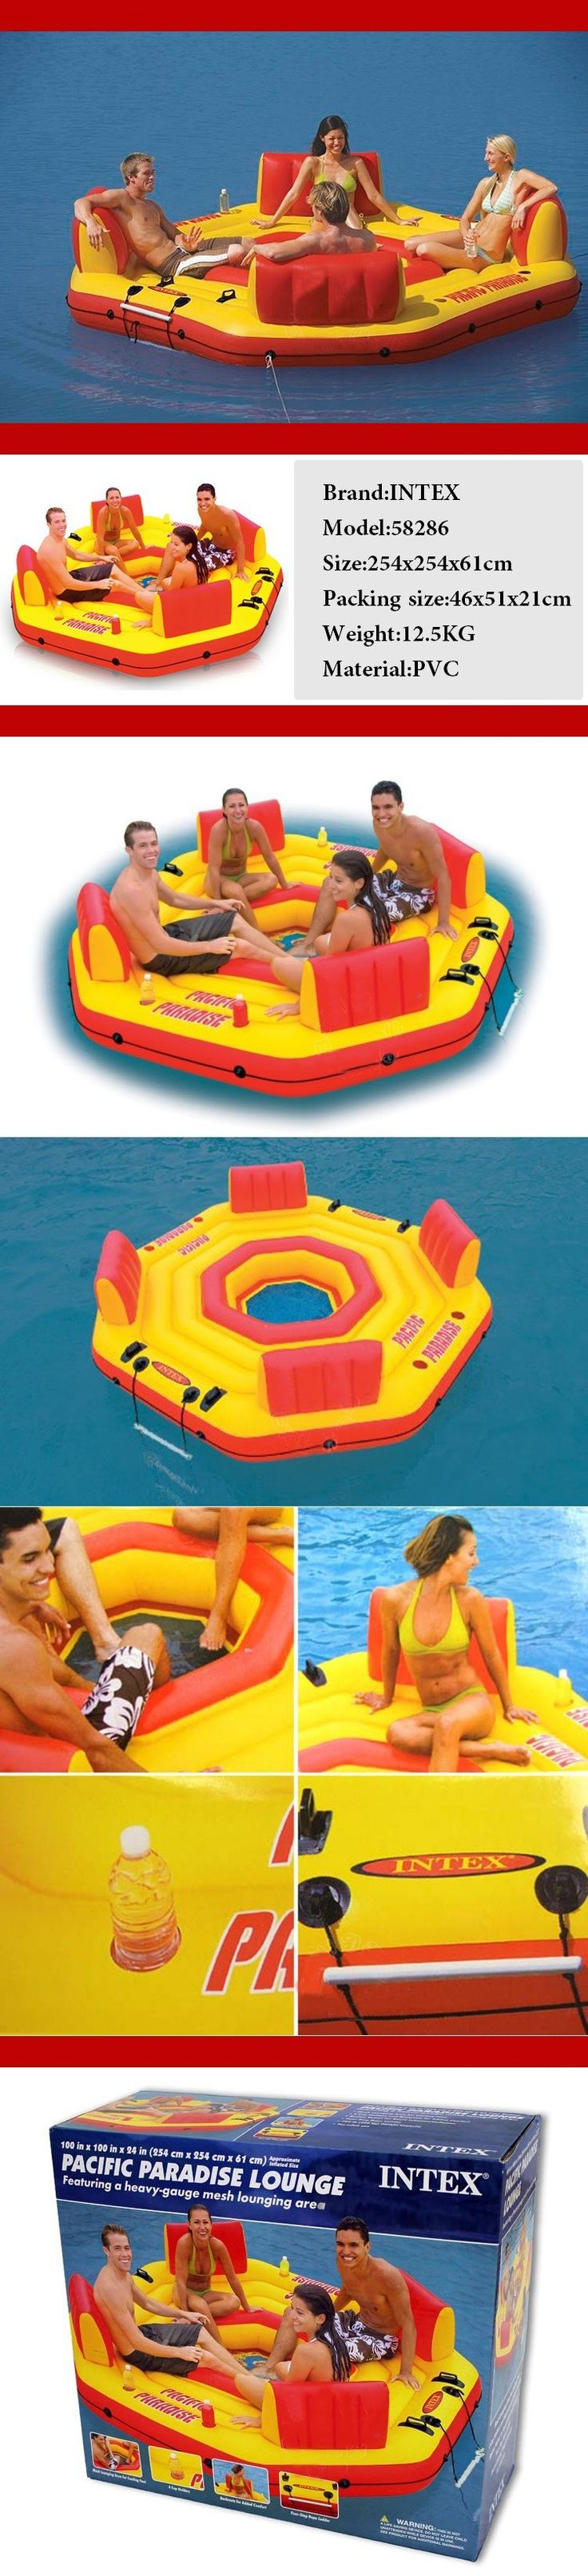 Intex-inflable-deportes-acuaacuteticos-flotador-de-la-natacioacuten-agua-anillo-